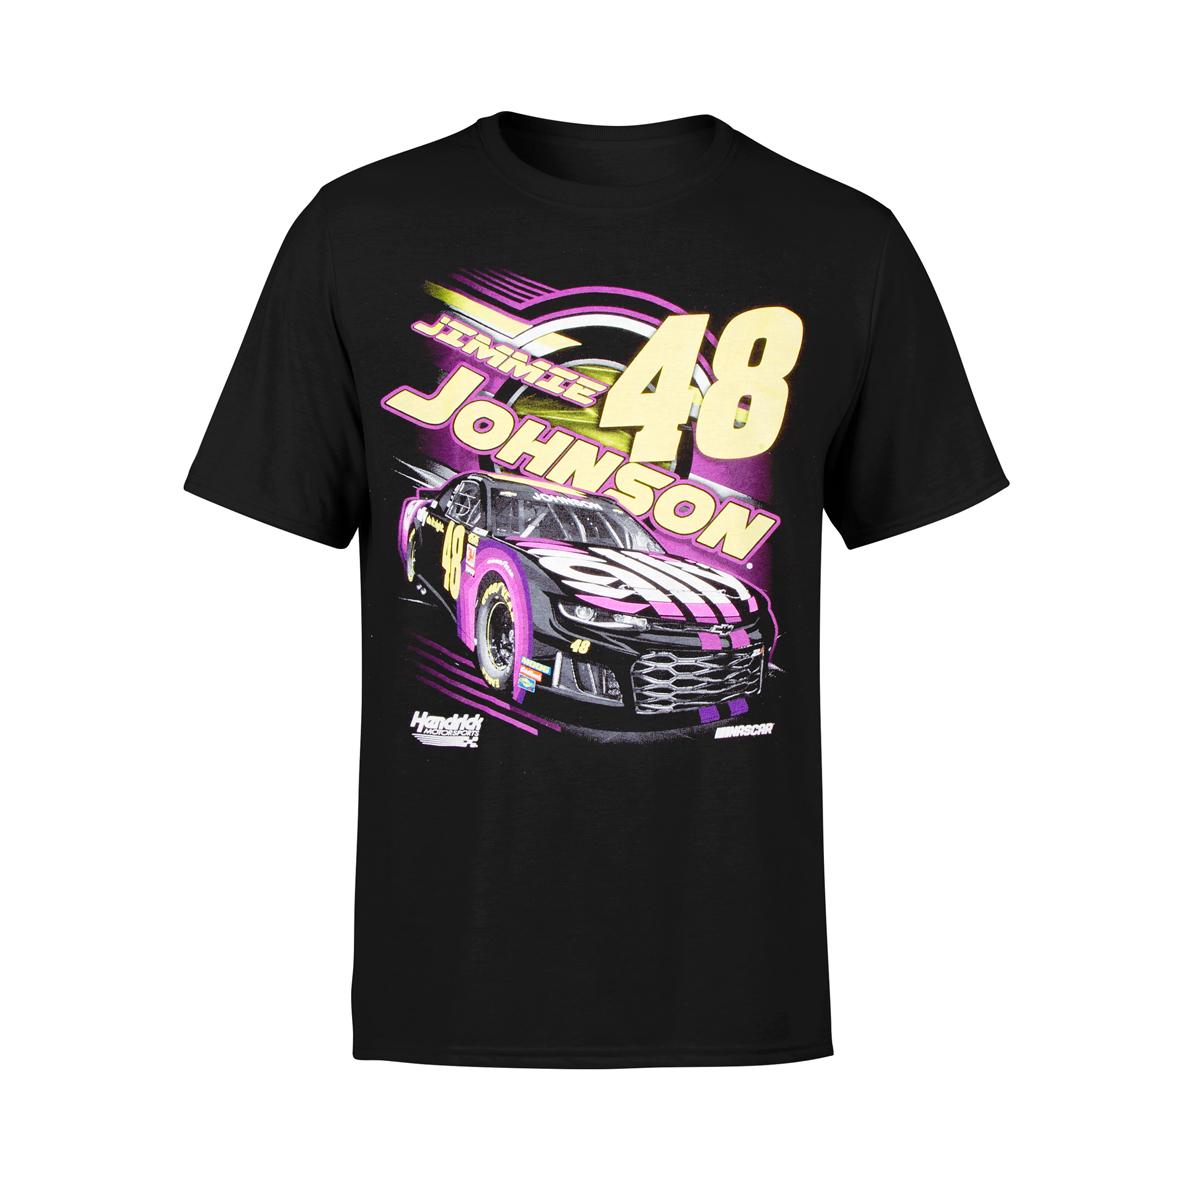 Jimmie Johnson #48 2019 NASCAR Ladies Vintage T-shirt